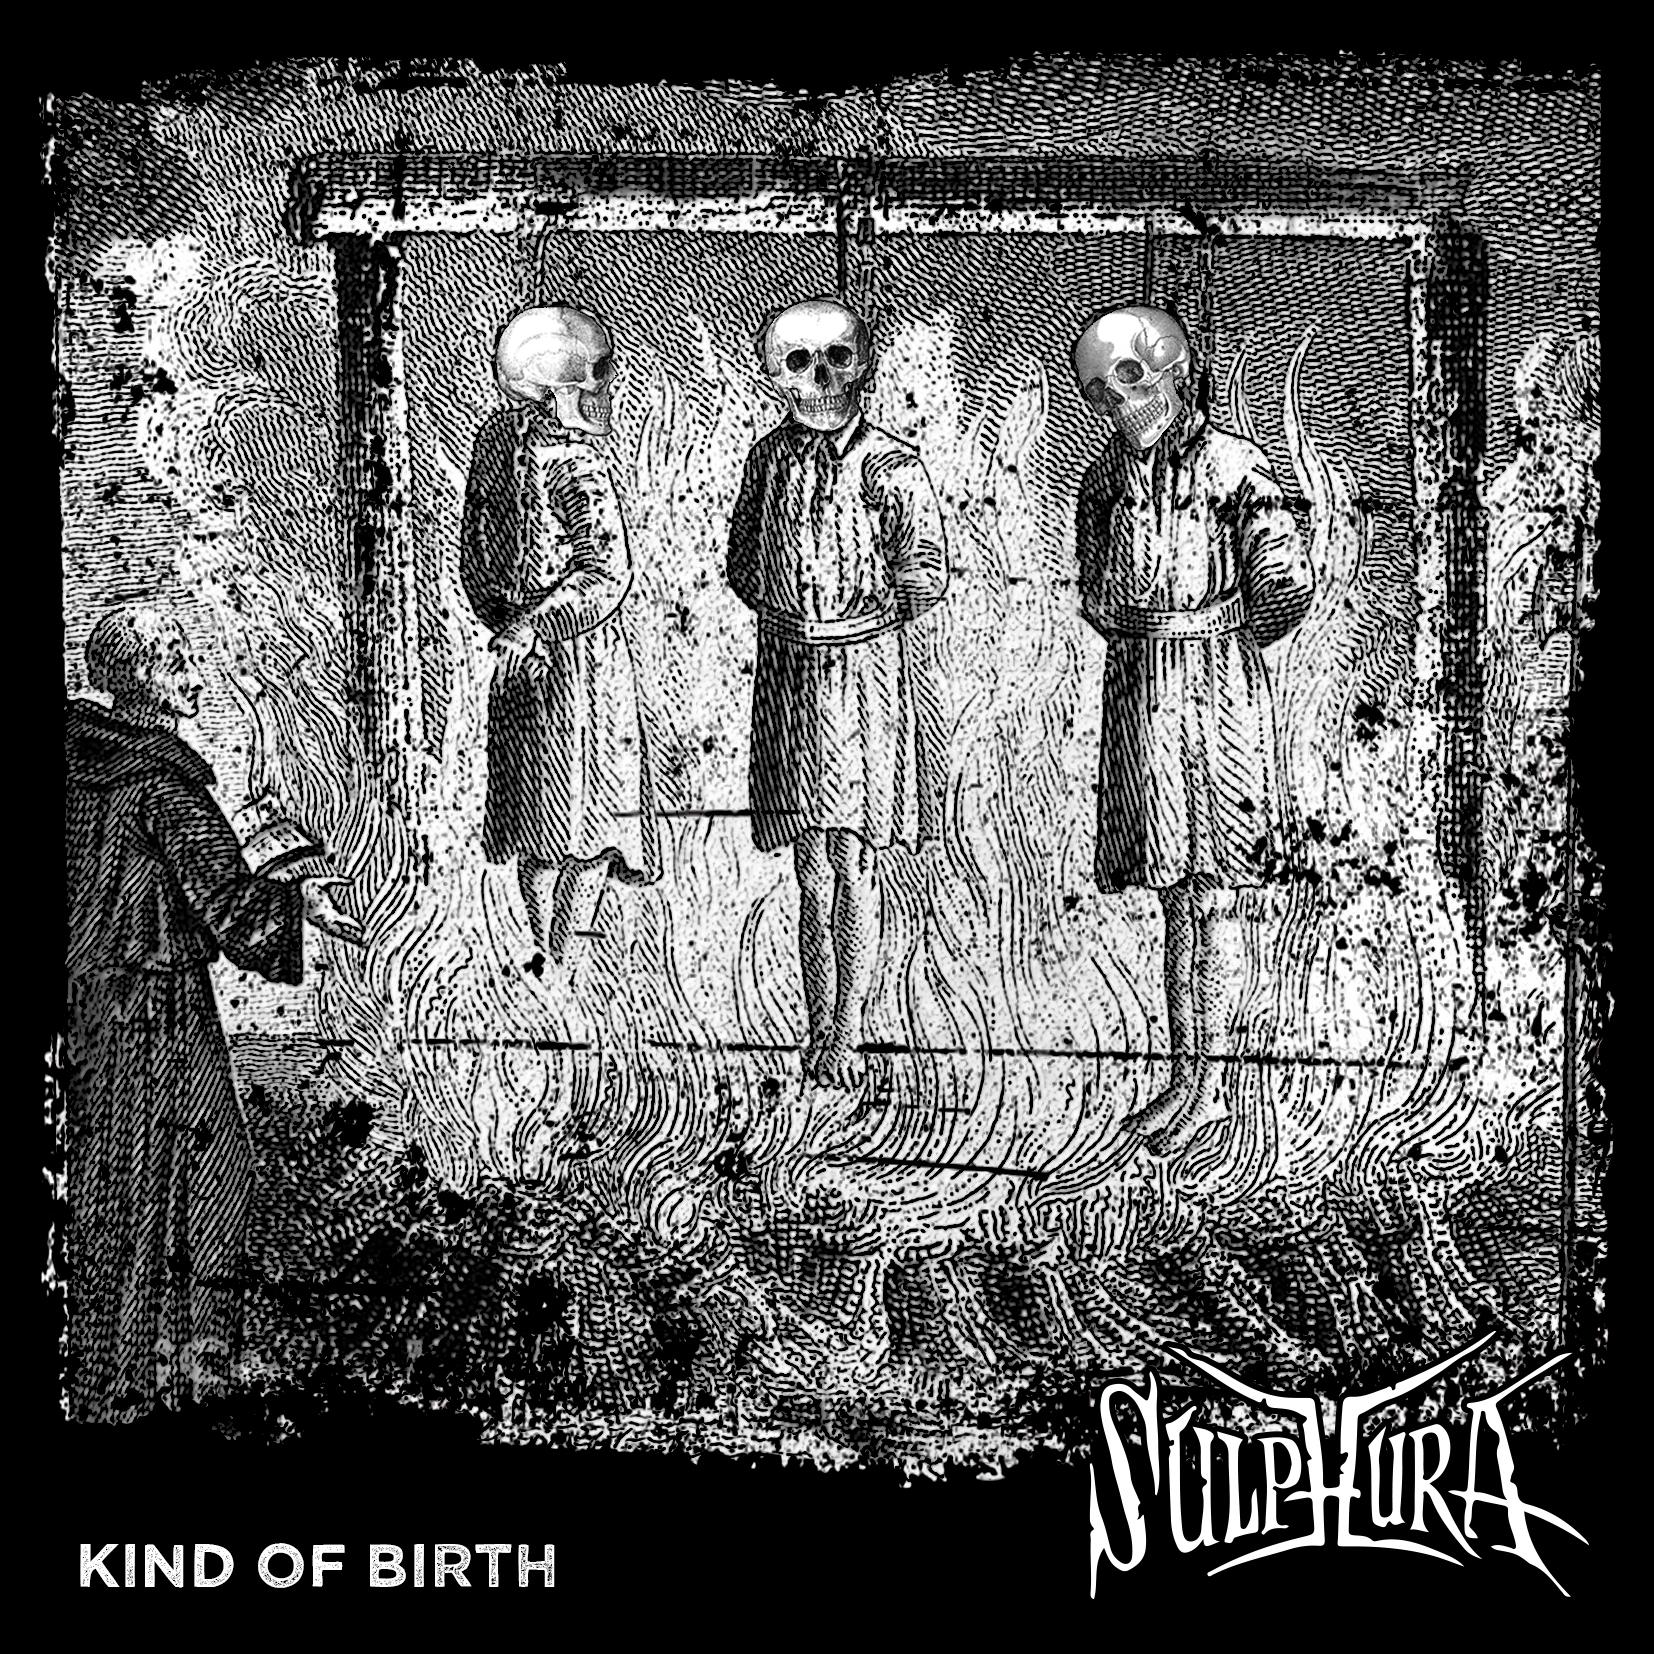 SULPHURA – KIND OF BIRTH (+patch)